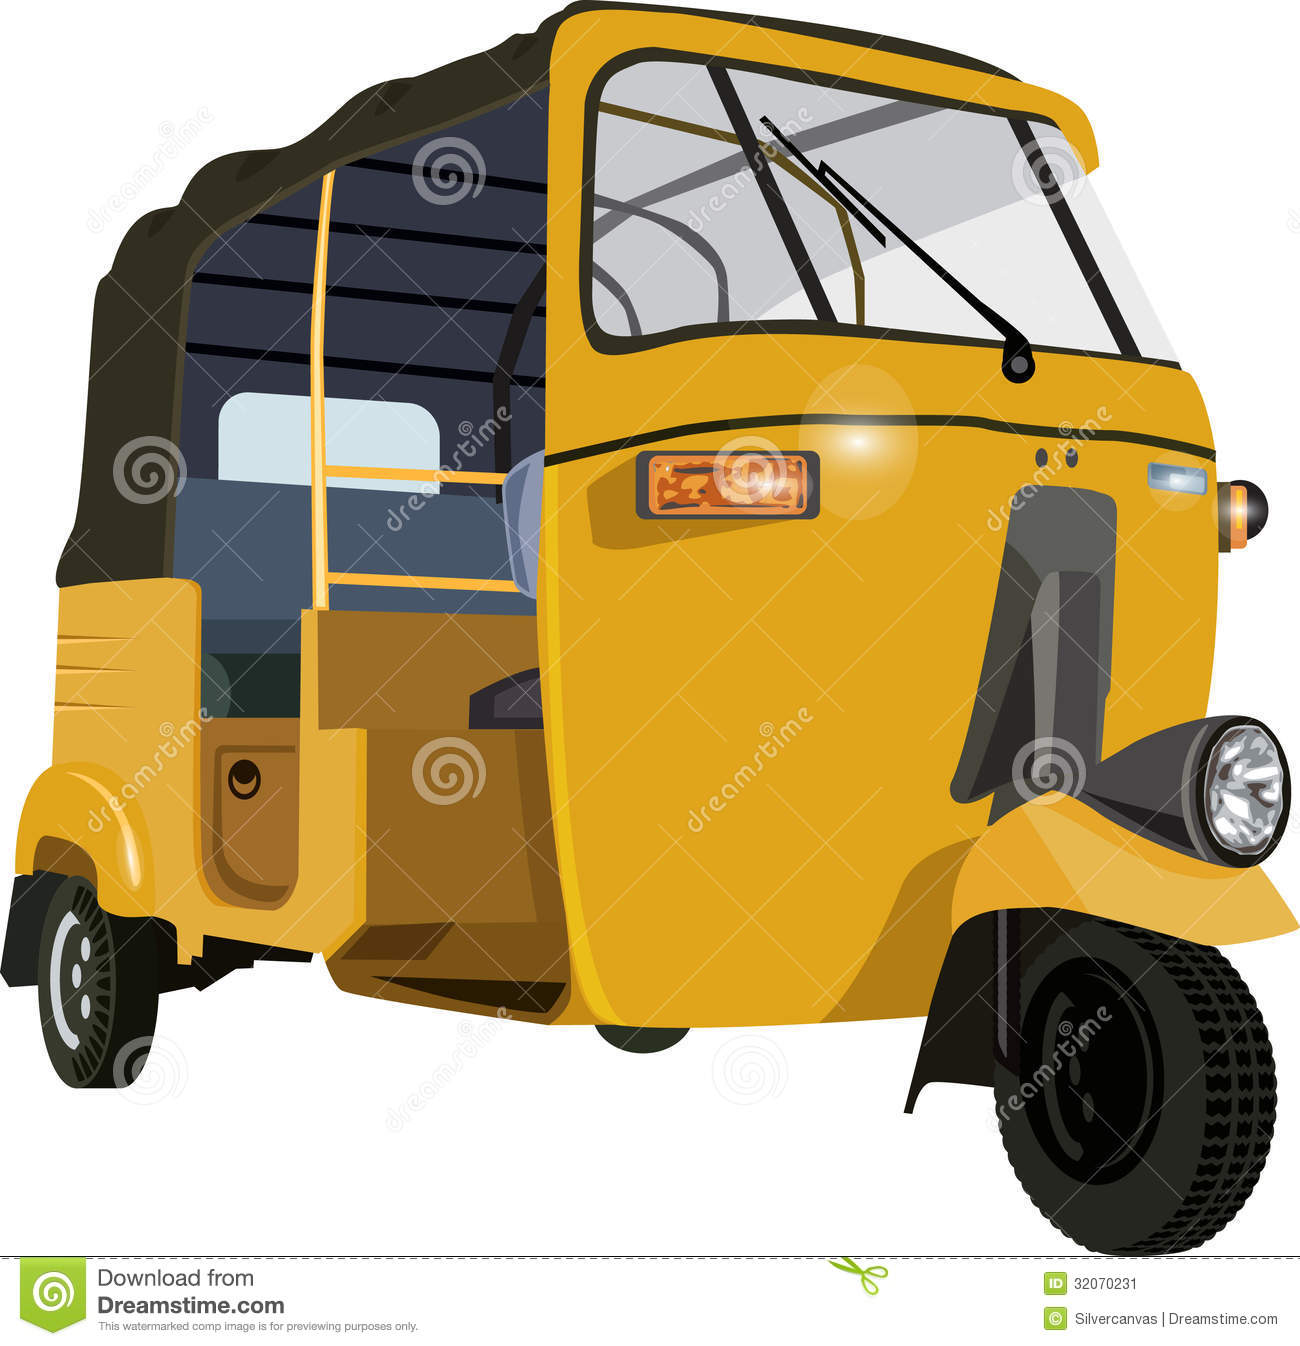 Auto-rickshaw clipart 20 free Cliparts | Download images ...